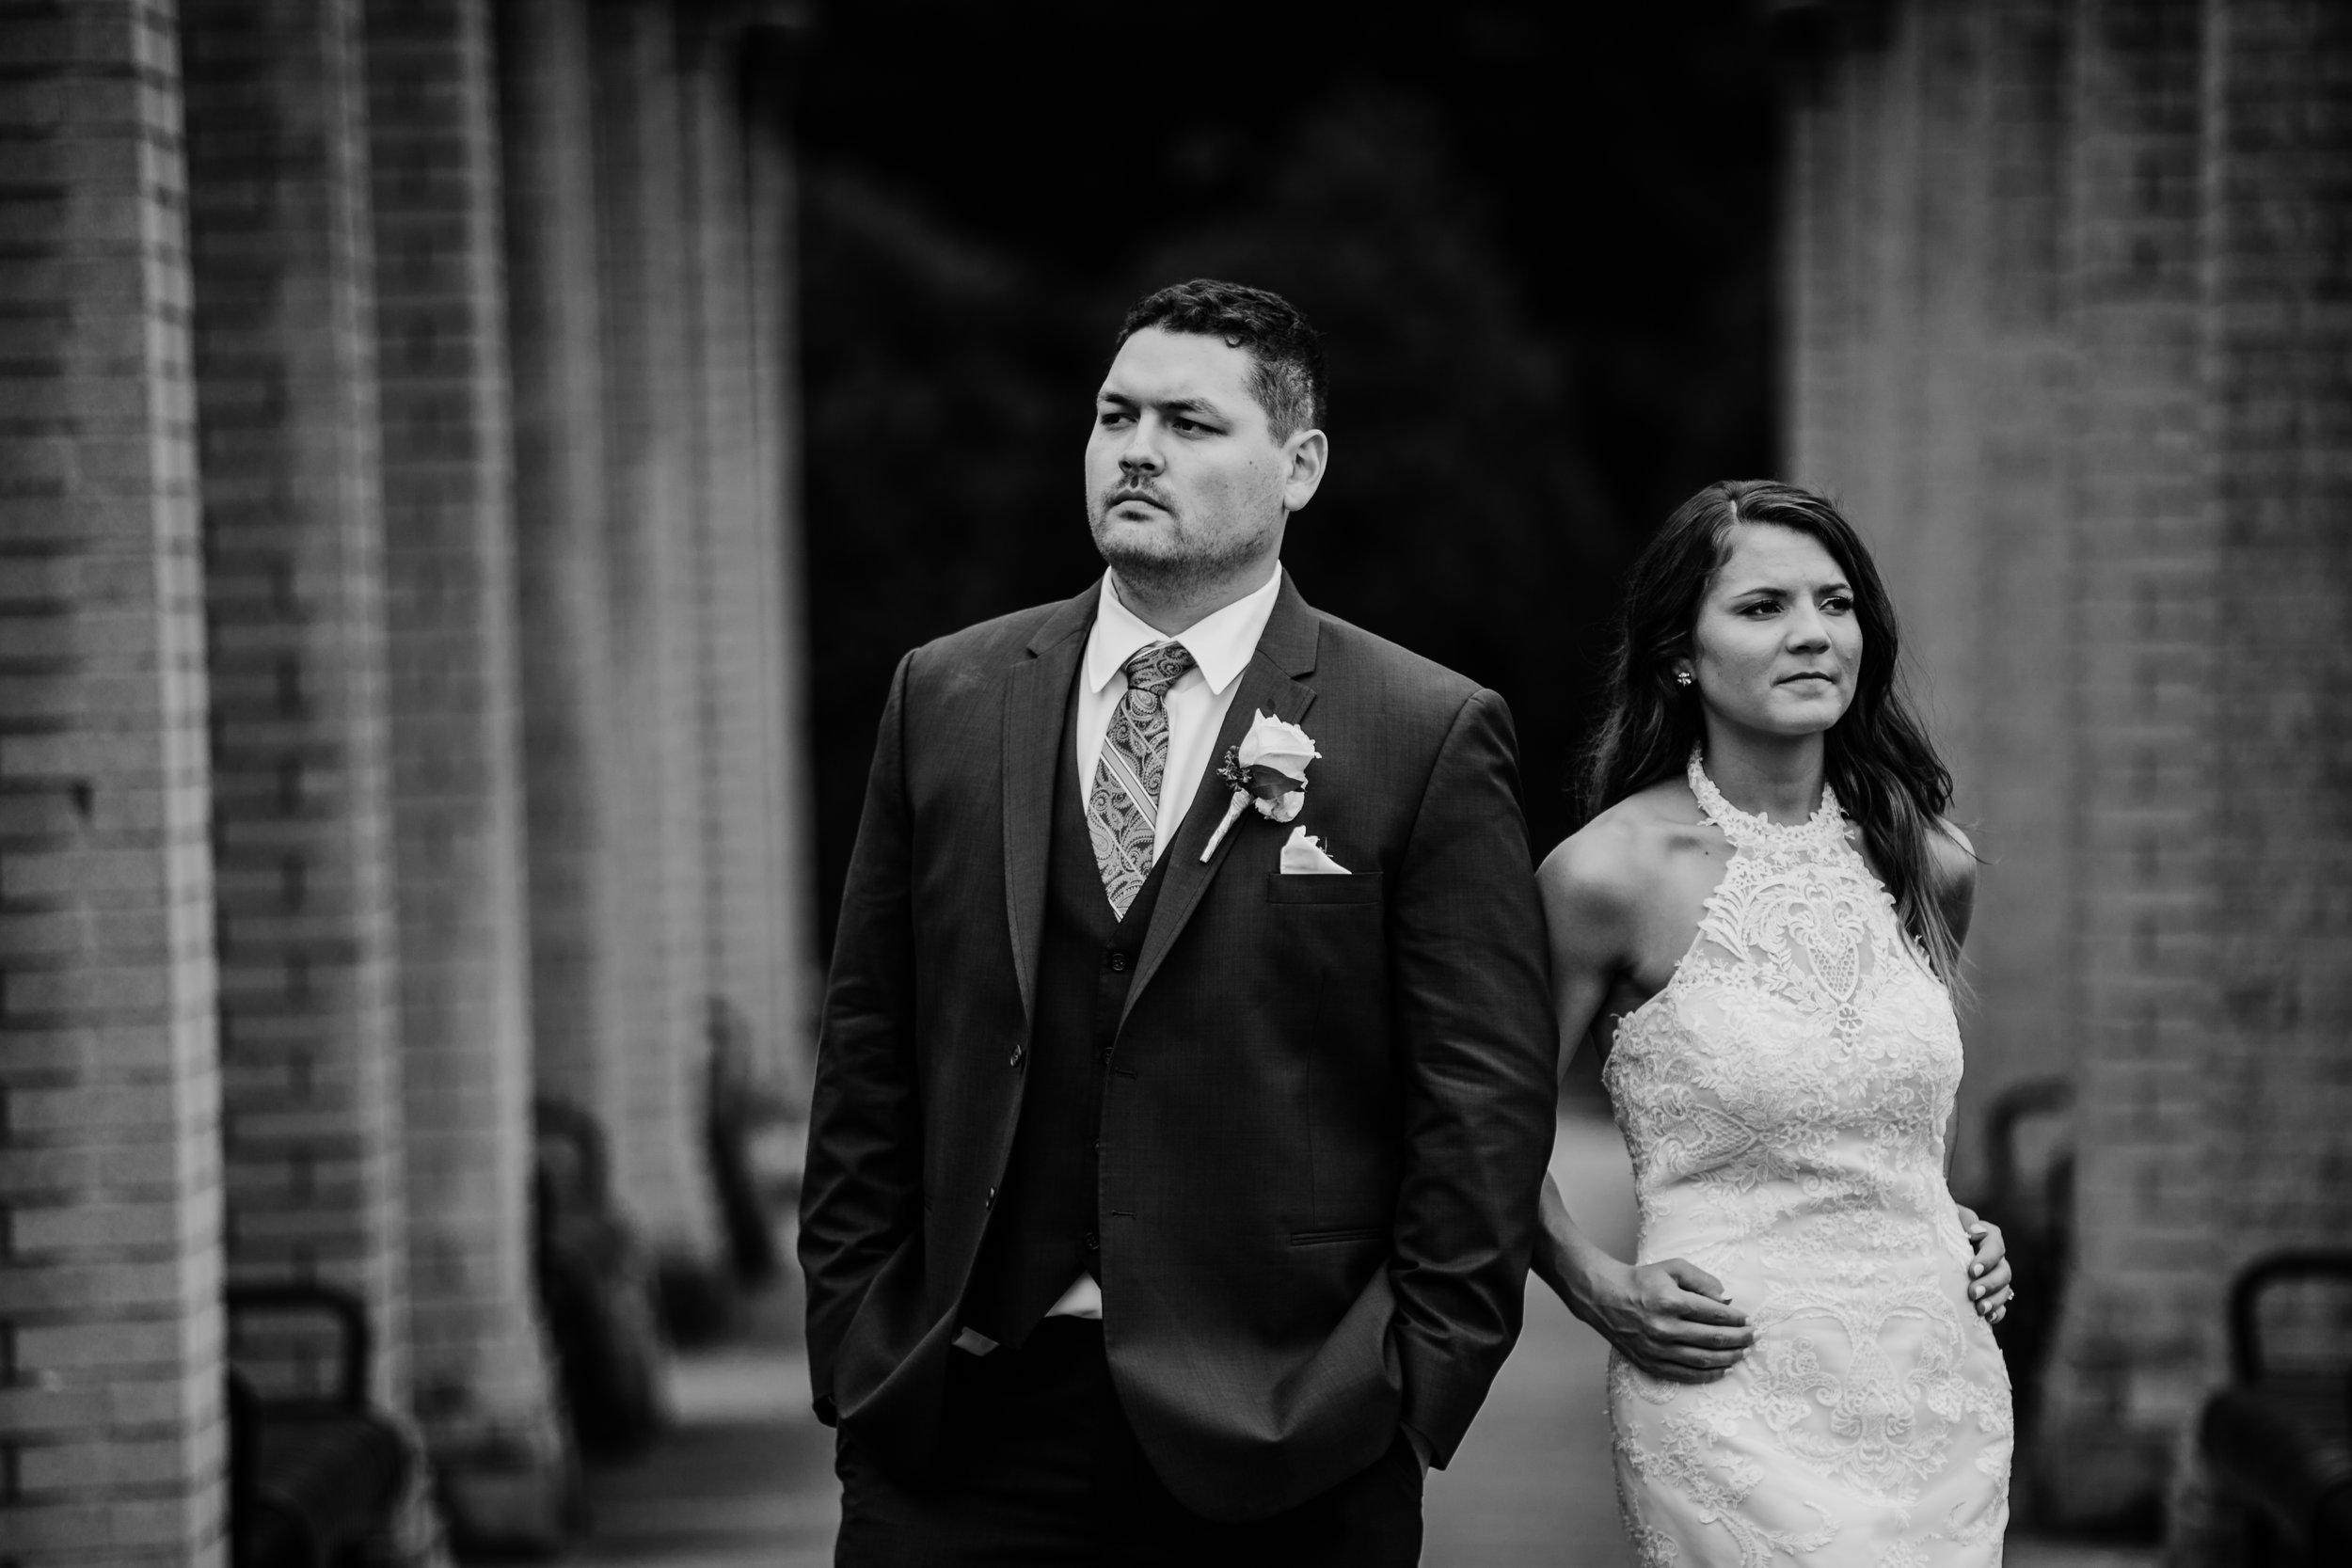 Dramatic-wedding-poses-at-vanderveer-davenport.jpg